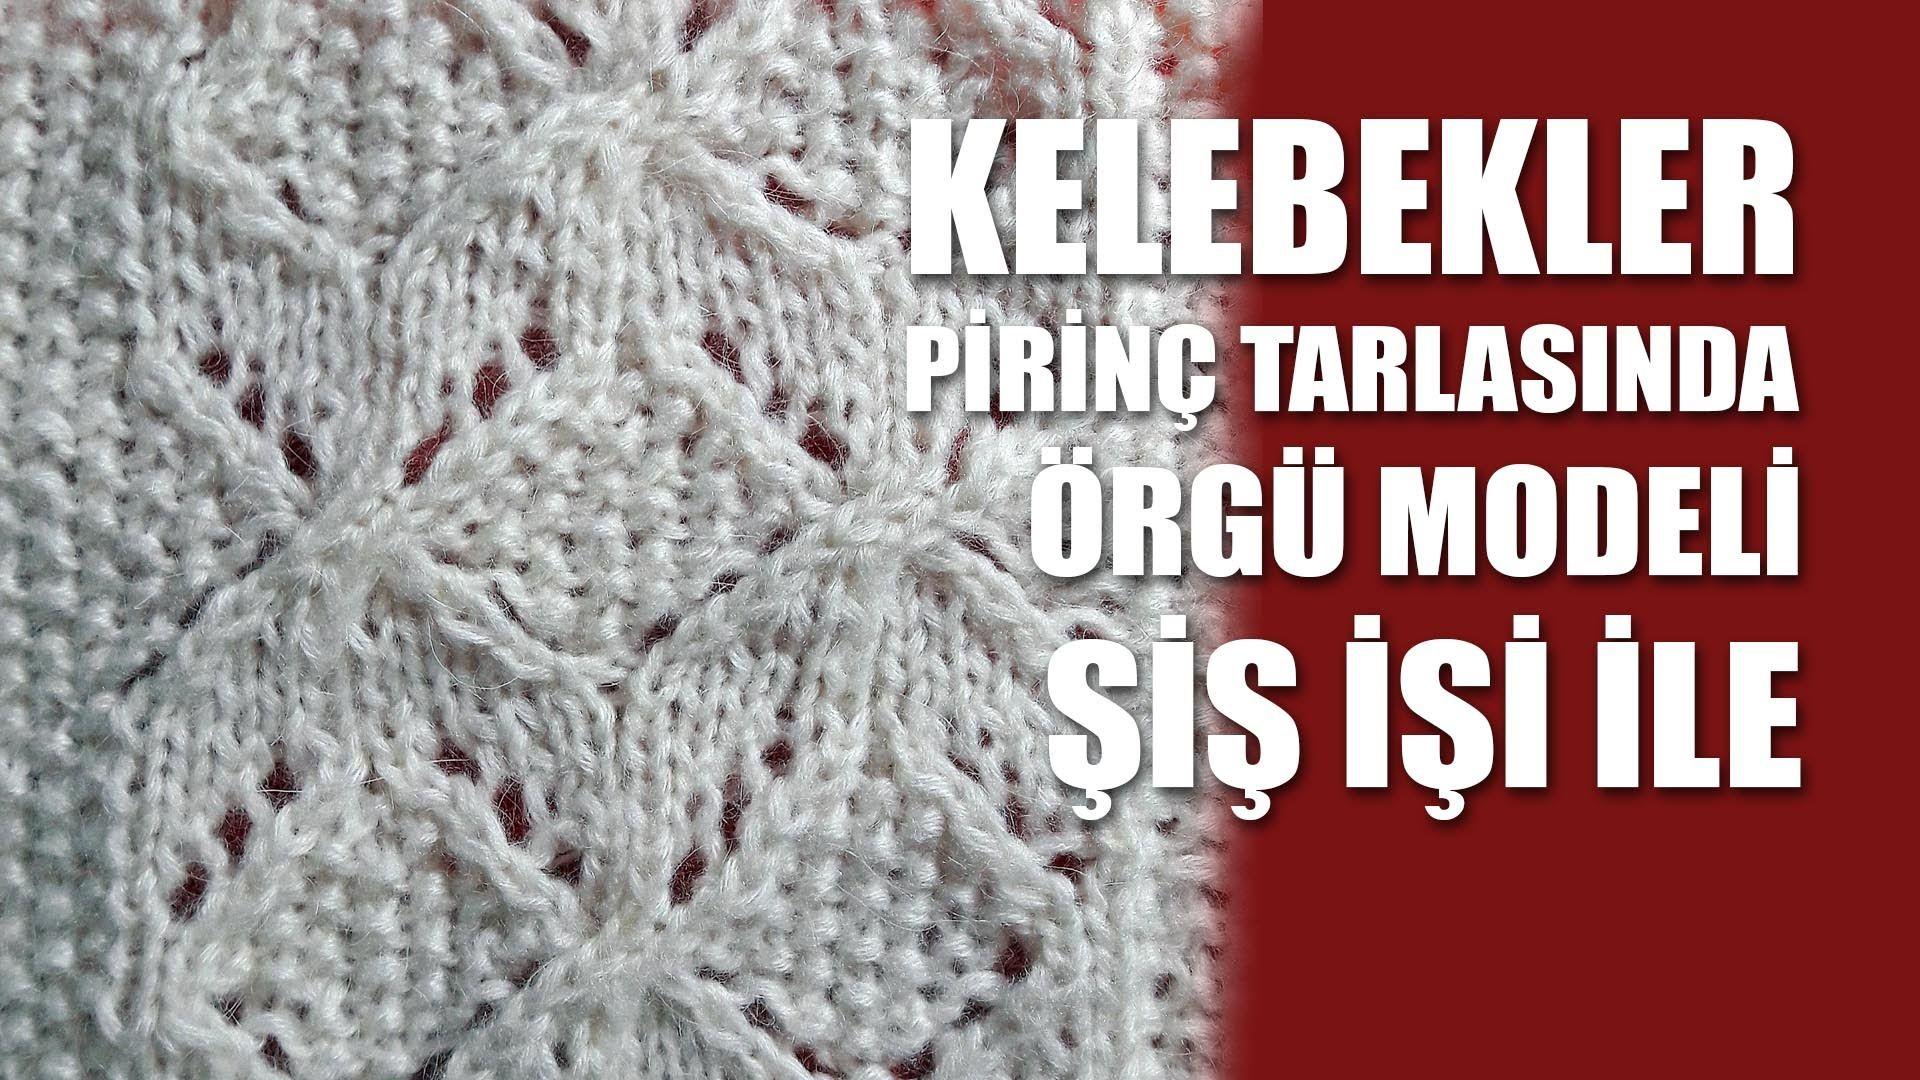 Kelebekler Prn Tarlasinda Knitting Stitch Patterns Tutorials